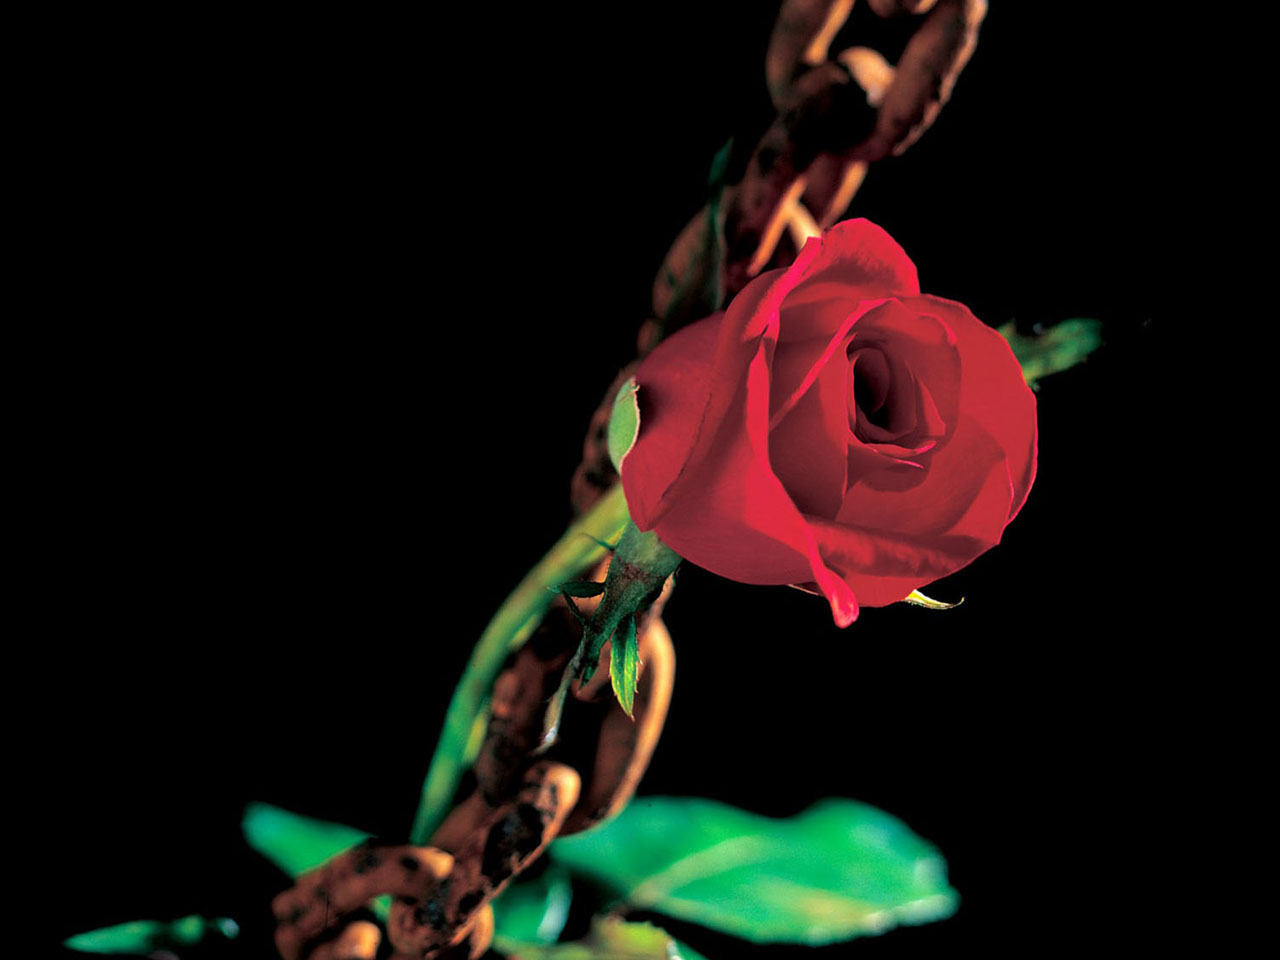 Full Wallpaper Romantic Roses Wallpaper